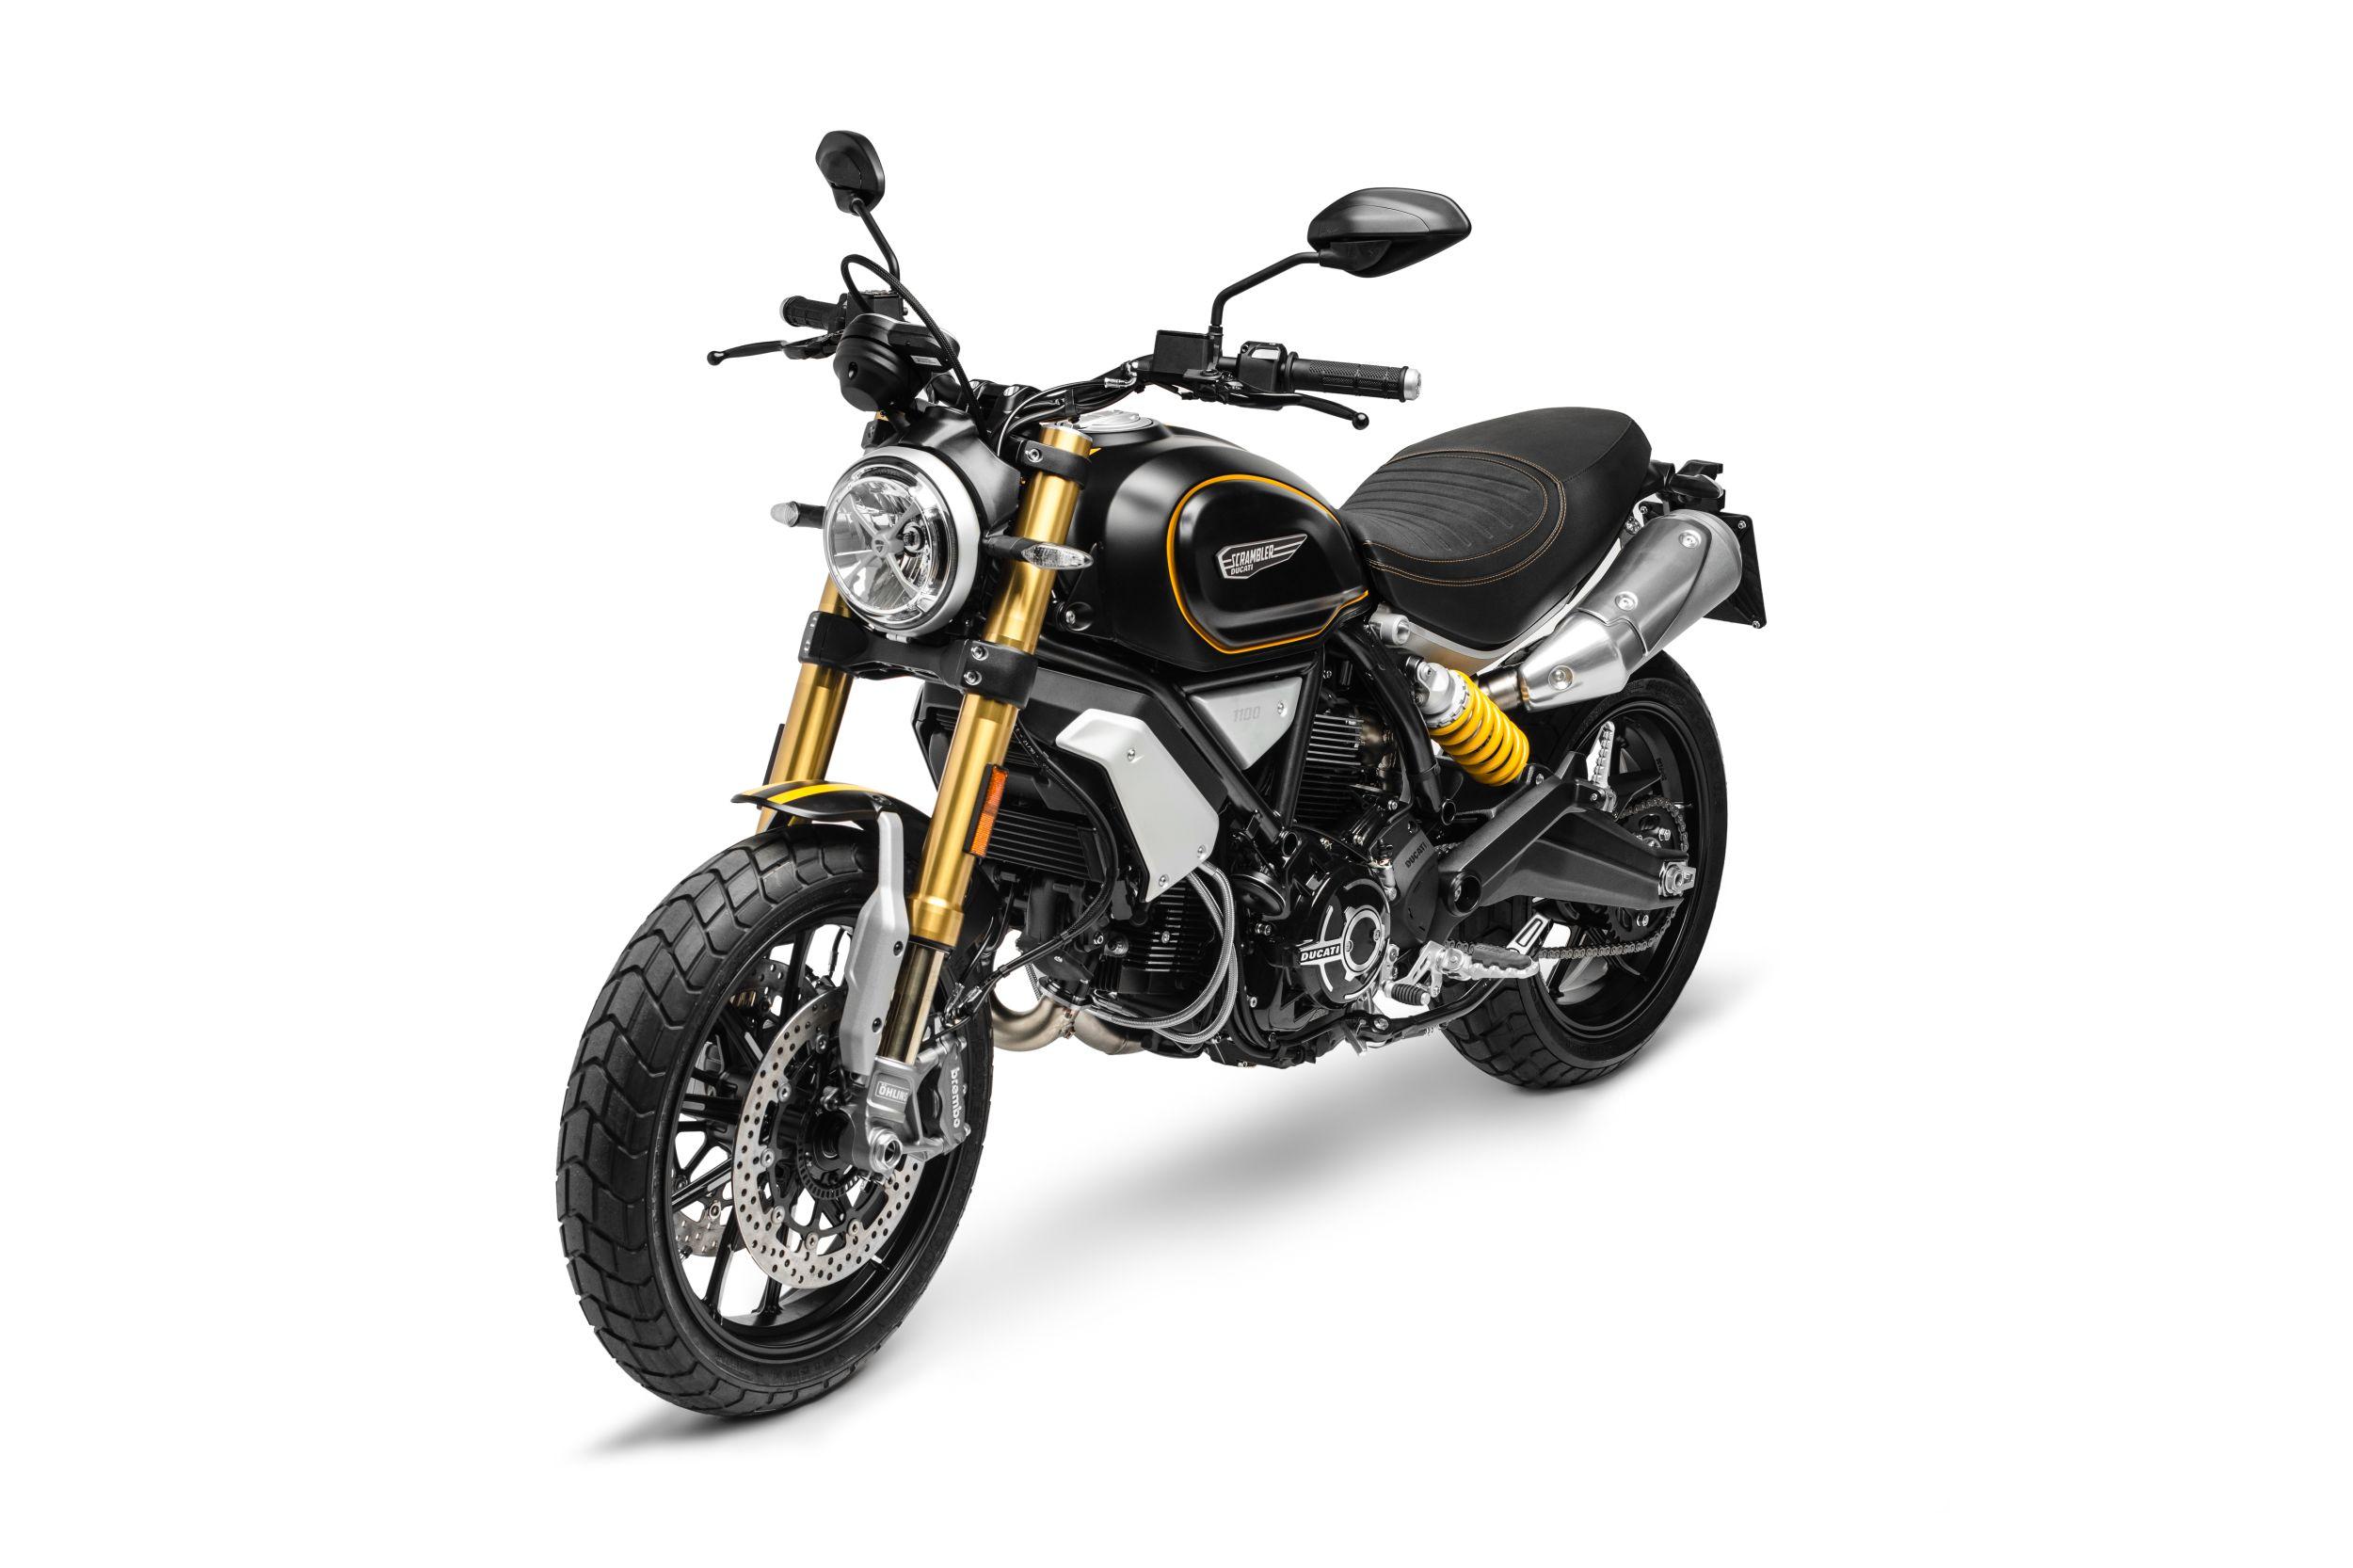 motorrad occasion ducati scrambler 1100 sport kaufen. Black Bedroom Furniture Sets. Home Design Ideas